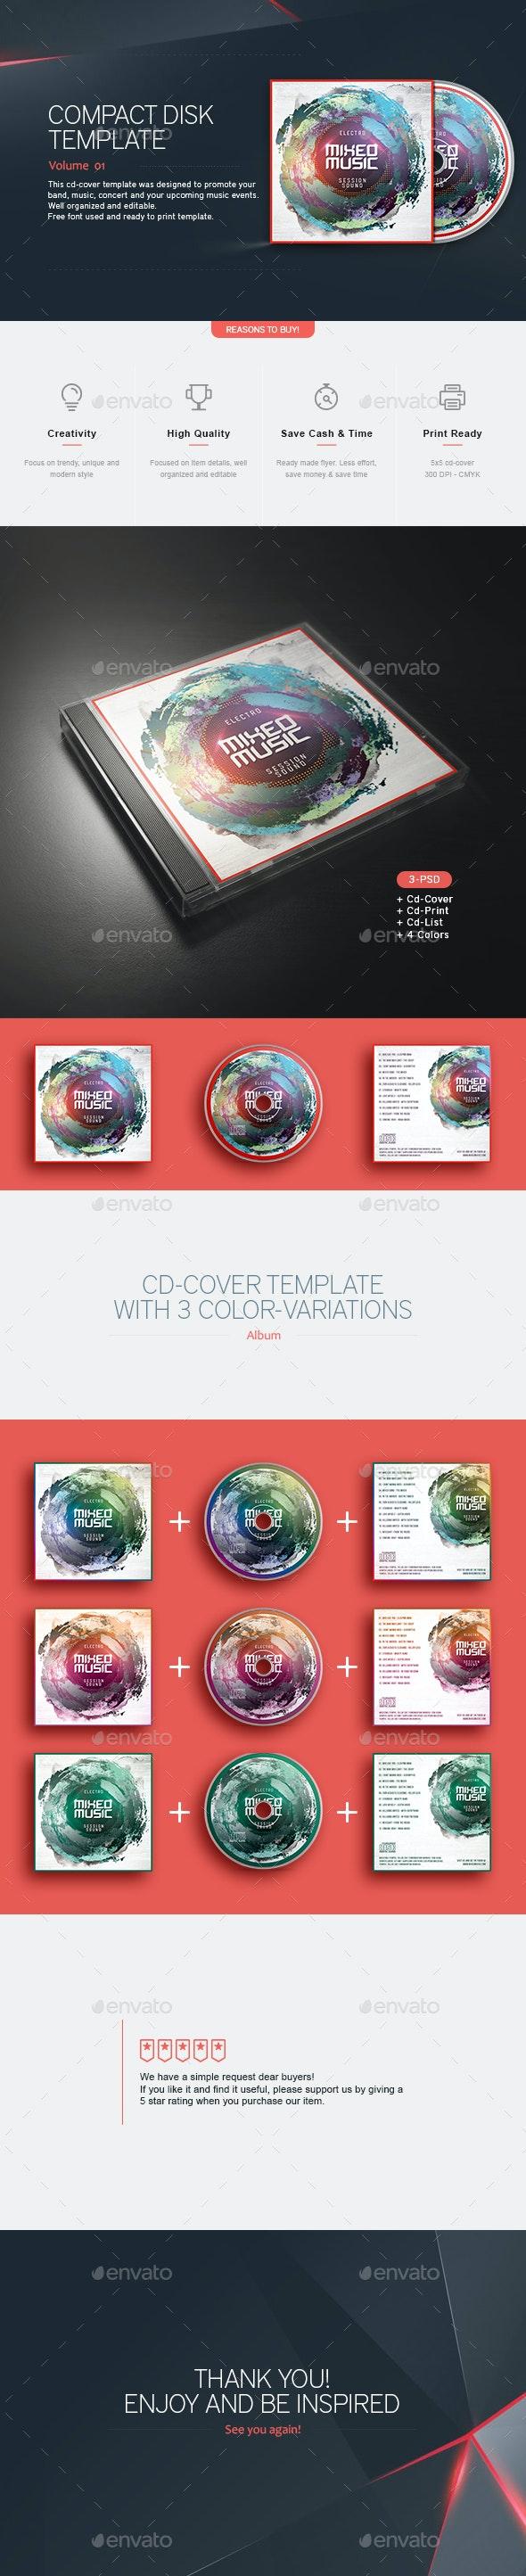 Mixed Music - CD Template - CD & DVD Artwork Print Templates